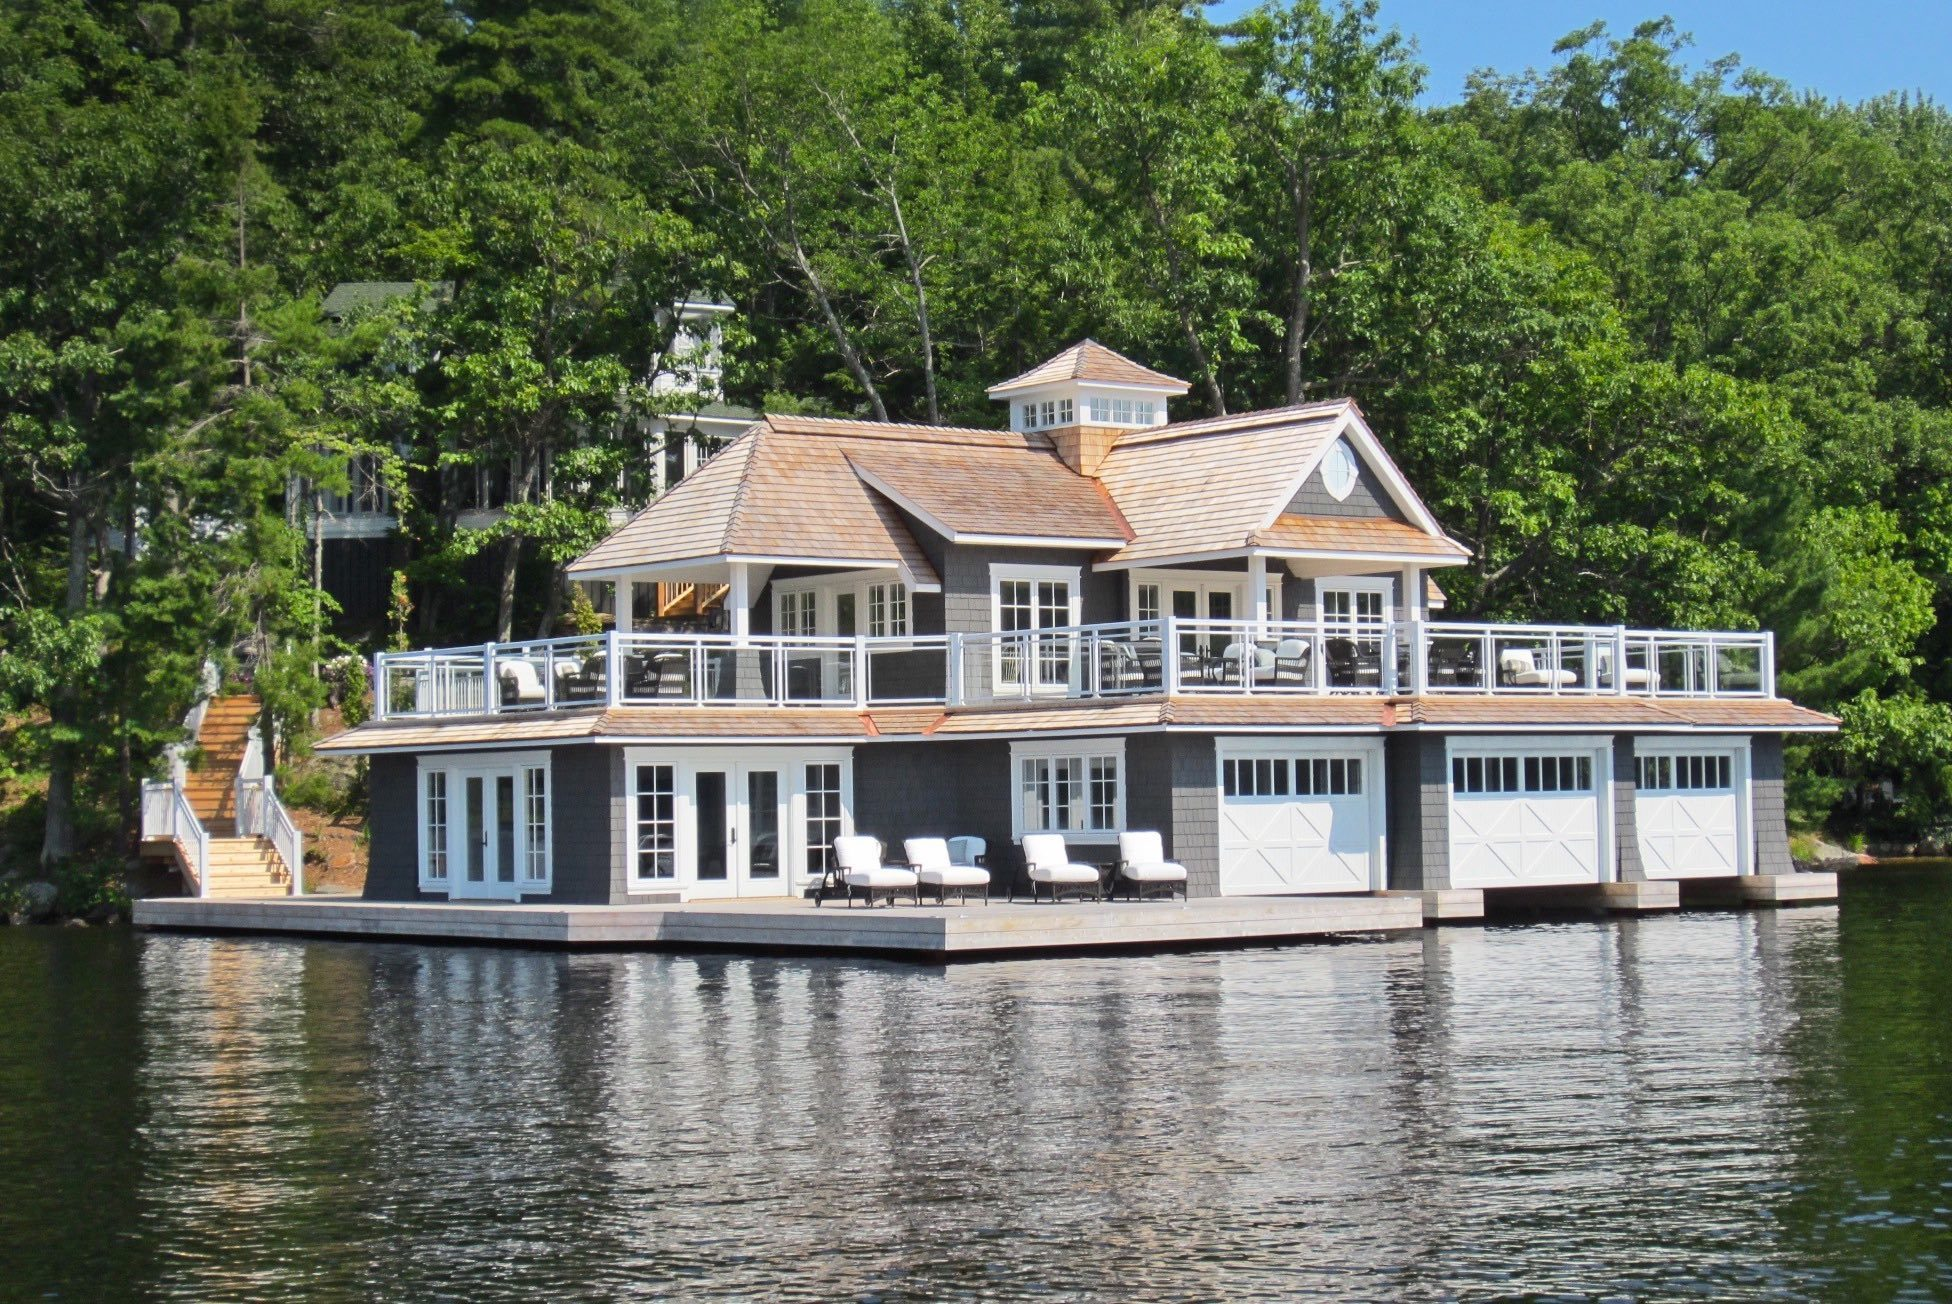 Muskoka Real Estate   Luxury Muskoka Cottages for Sale   Gord Waites